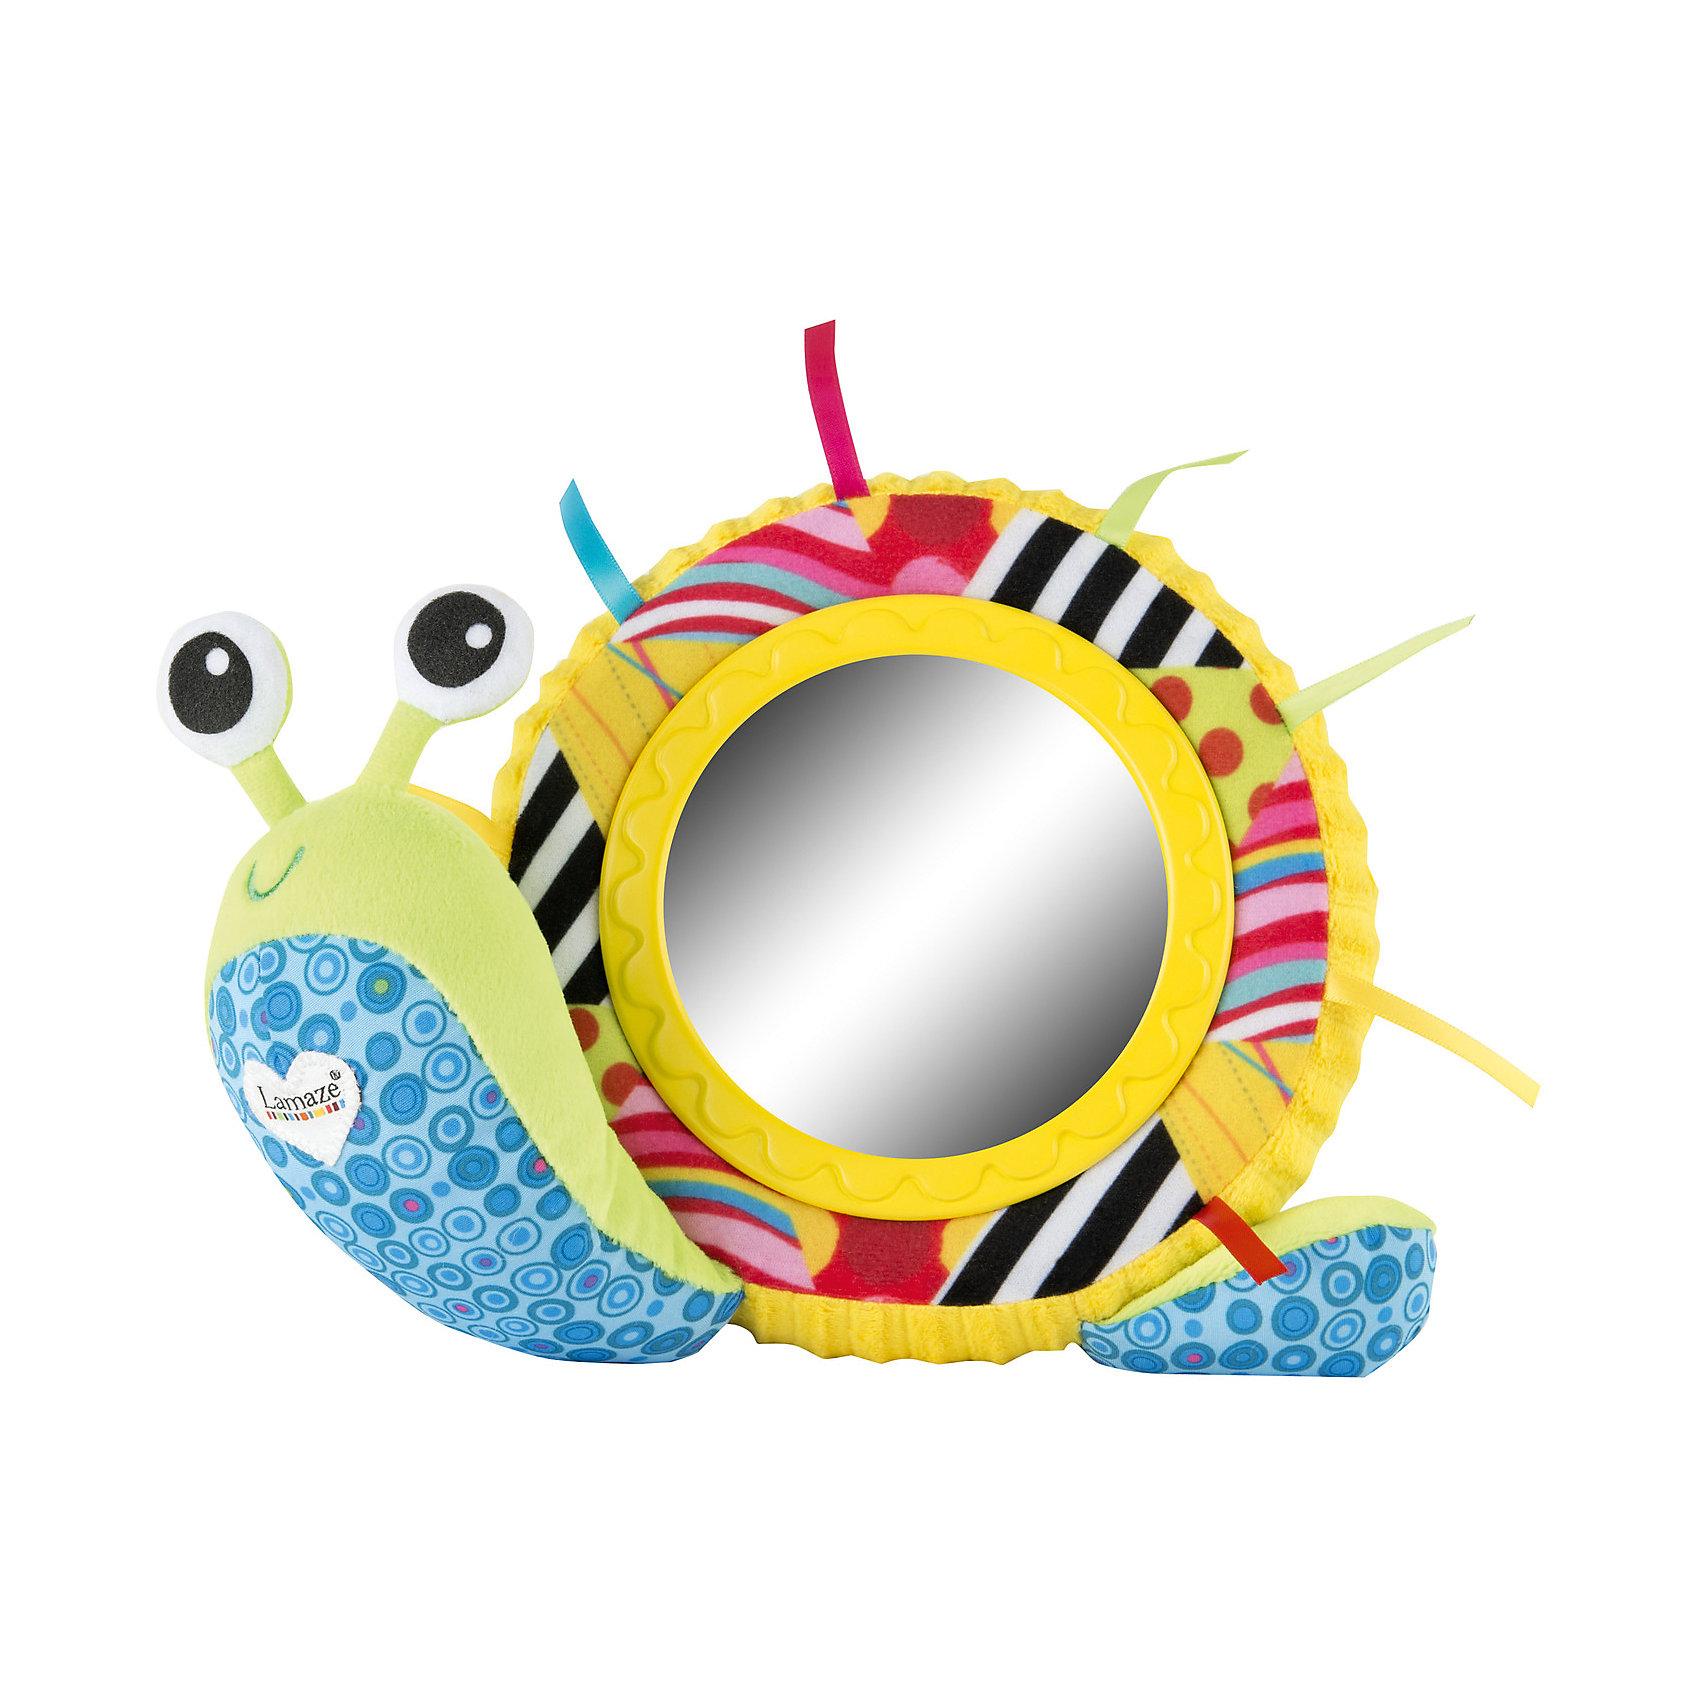 TOMY Мягкая игрушка Улитка Мишель с зеркальцем, свет, звук, Tomy Lamaze